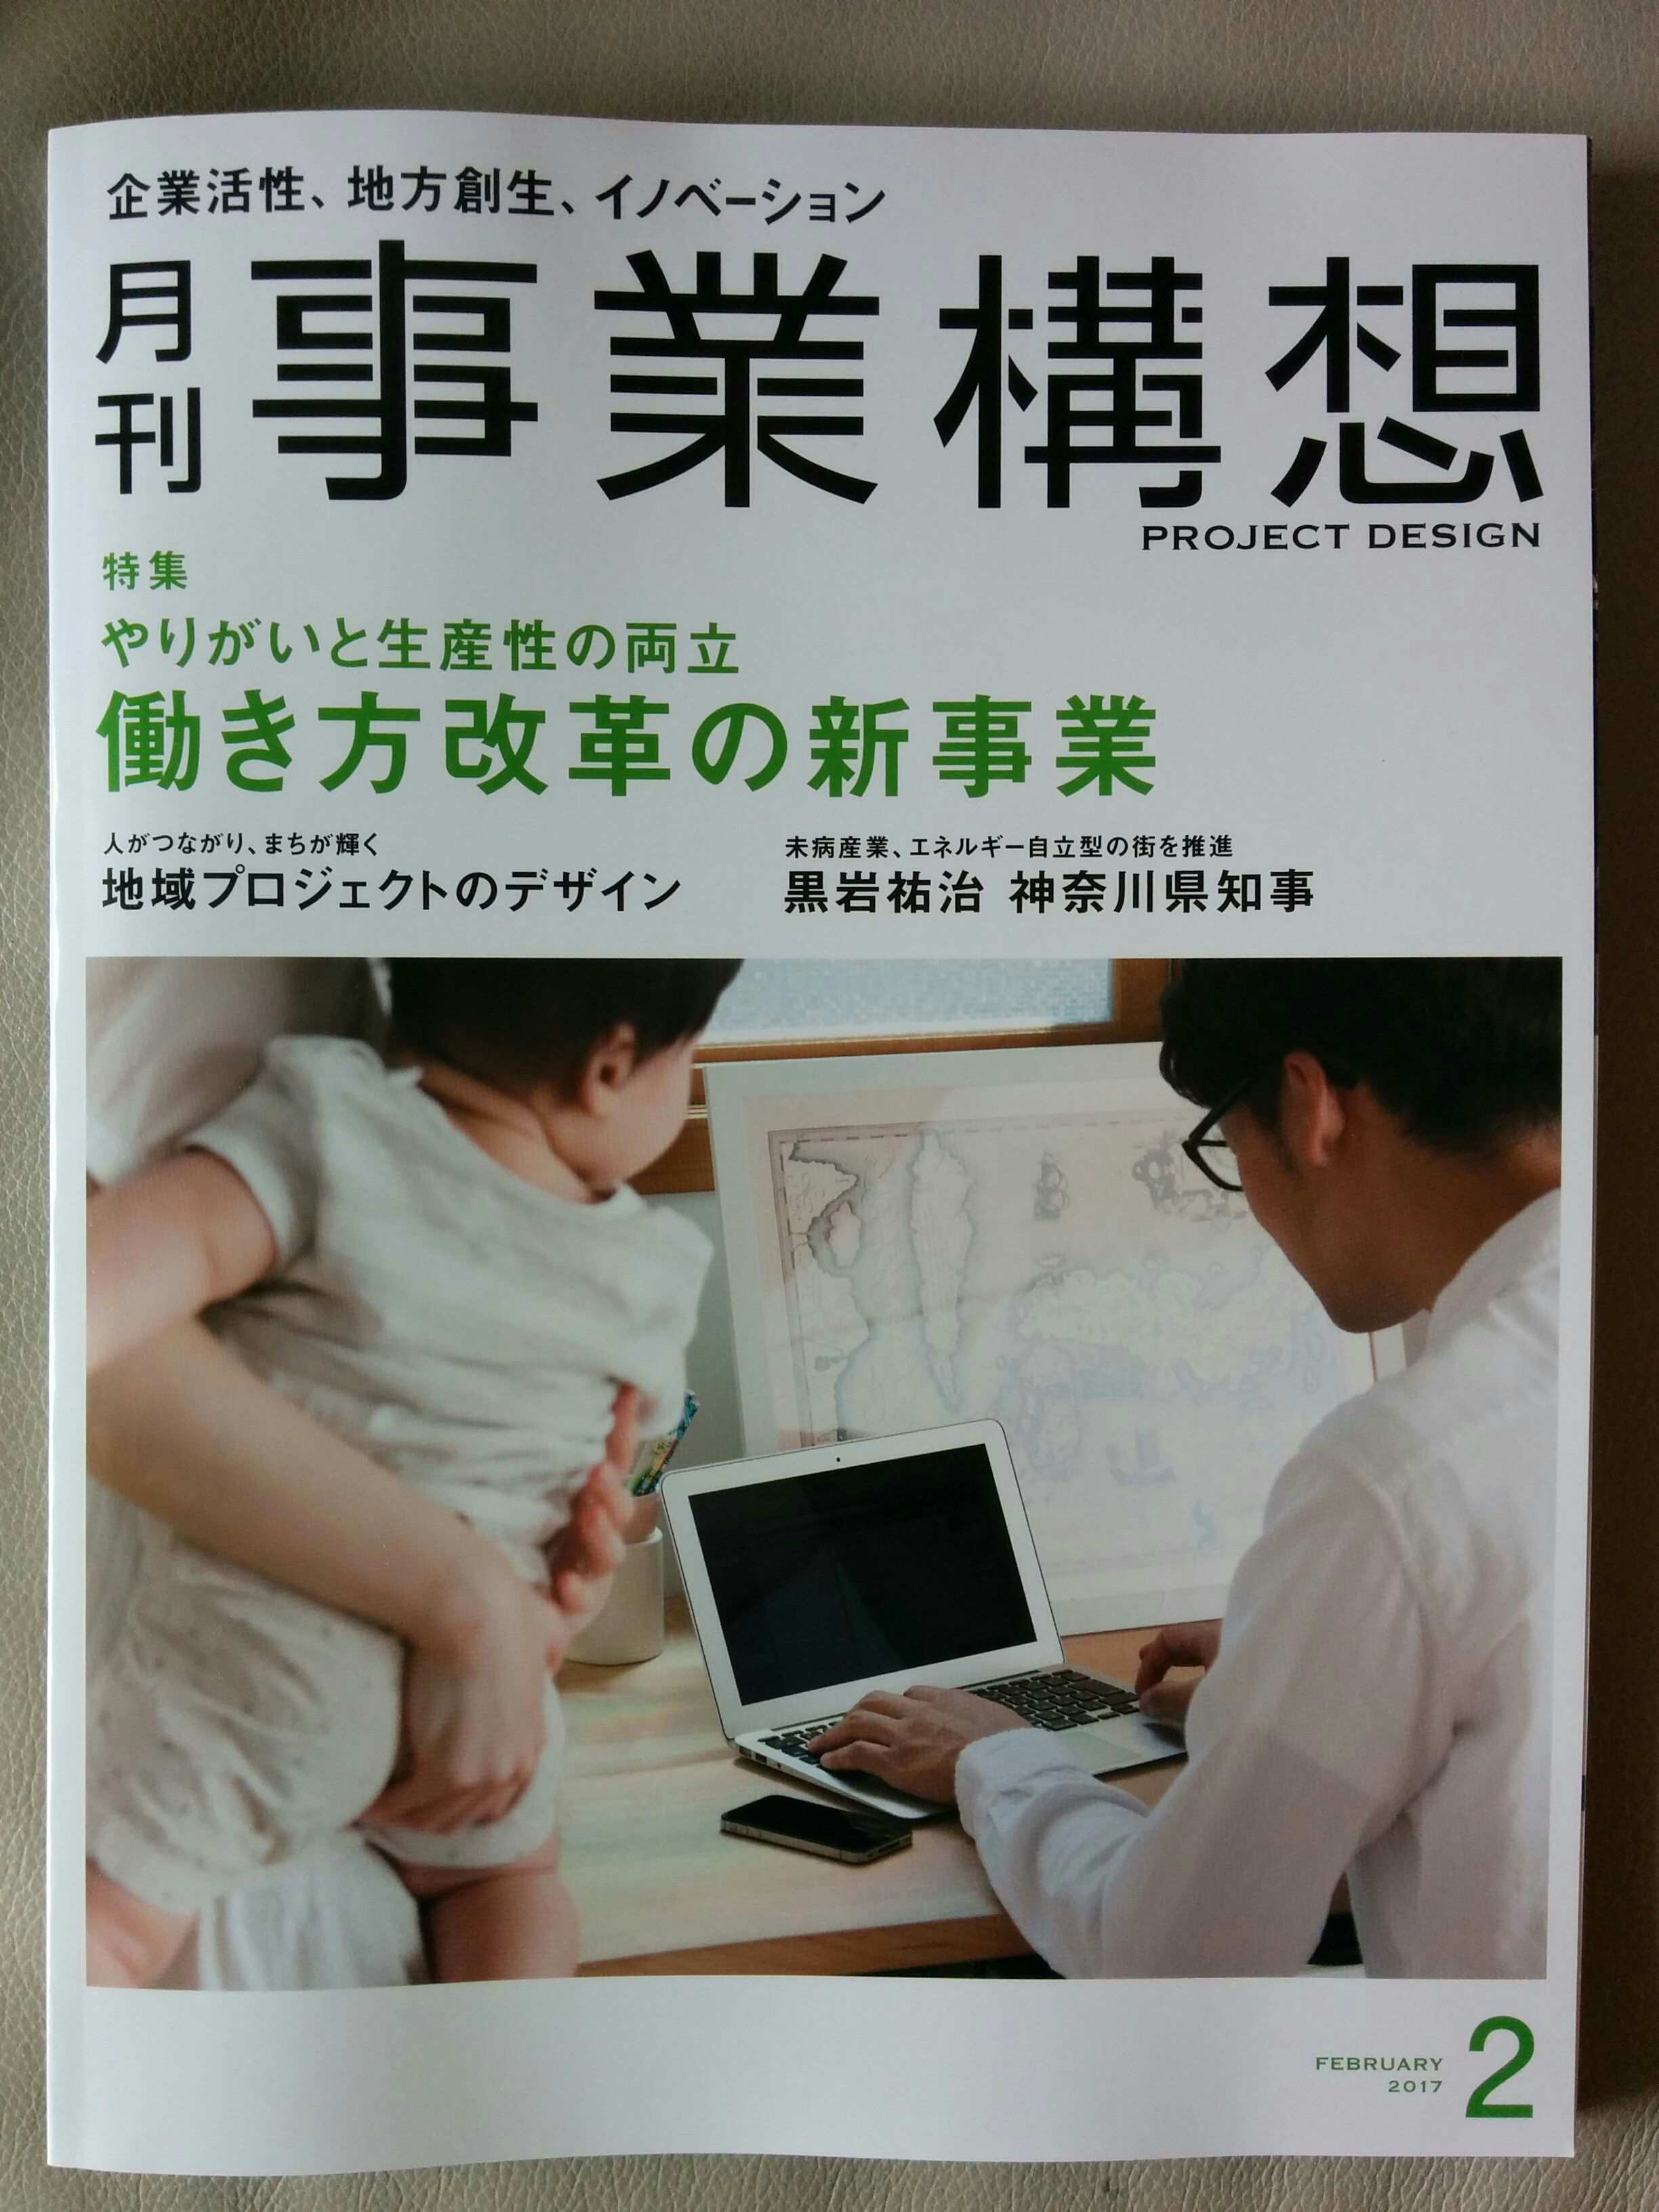 月刊事業構想2月号「働き方改革の新事業」に掲載